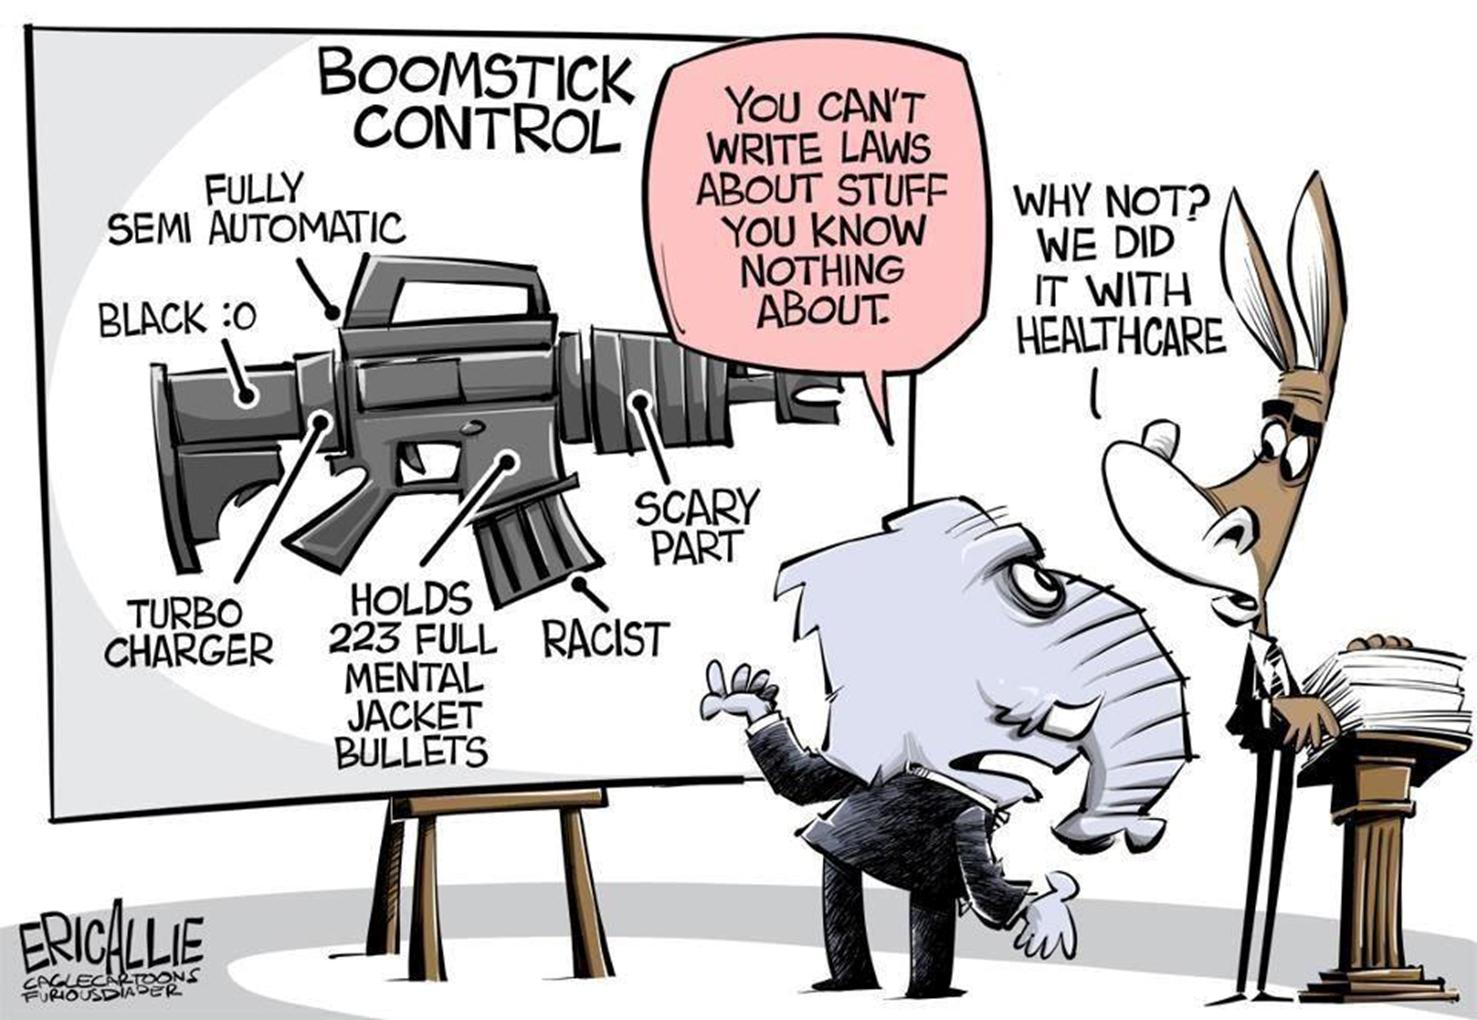 Good essay titles about opposing gun control